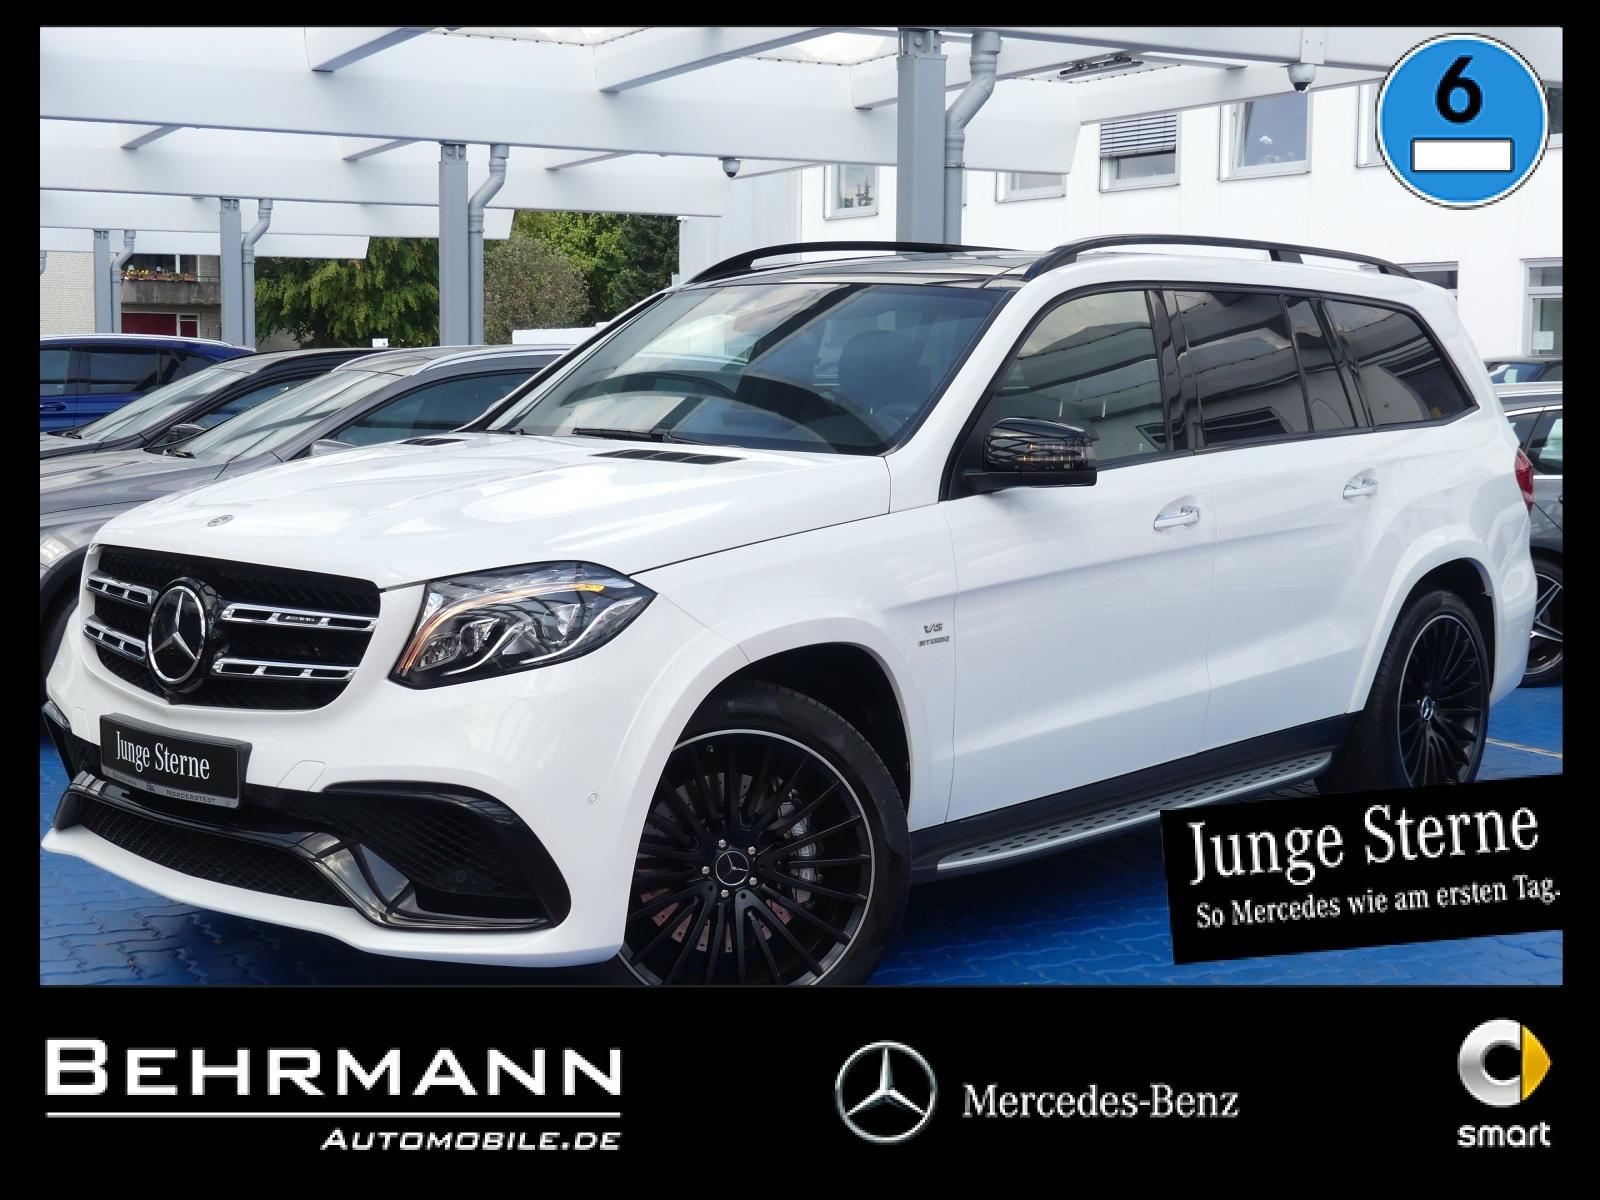 Mercedes-Benz GLS 63 AMG 4M ++Distronic+Panorama+TV+Airmatic++, Jahr 2017, petrol